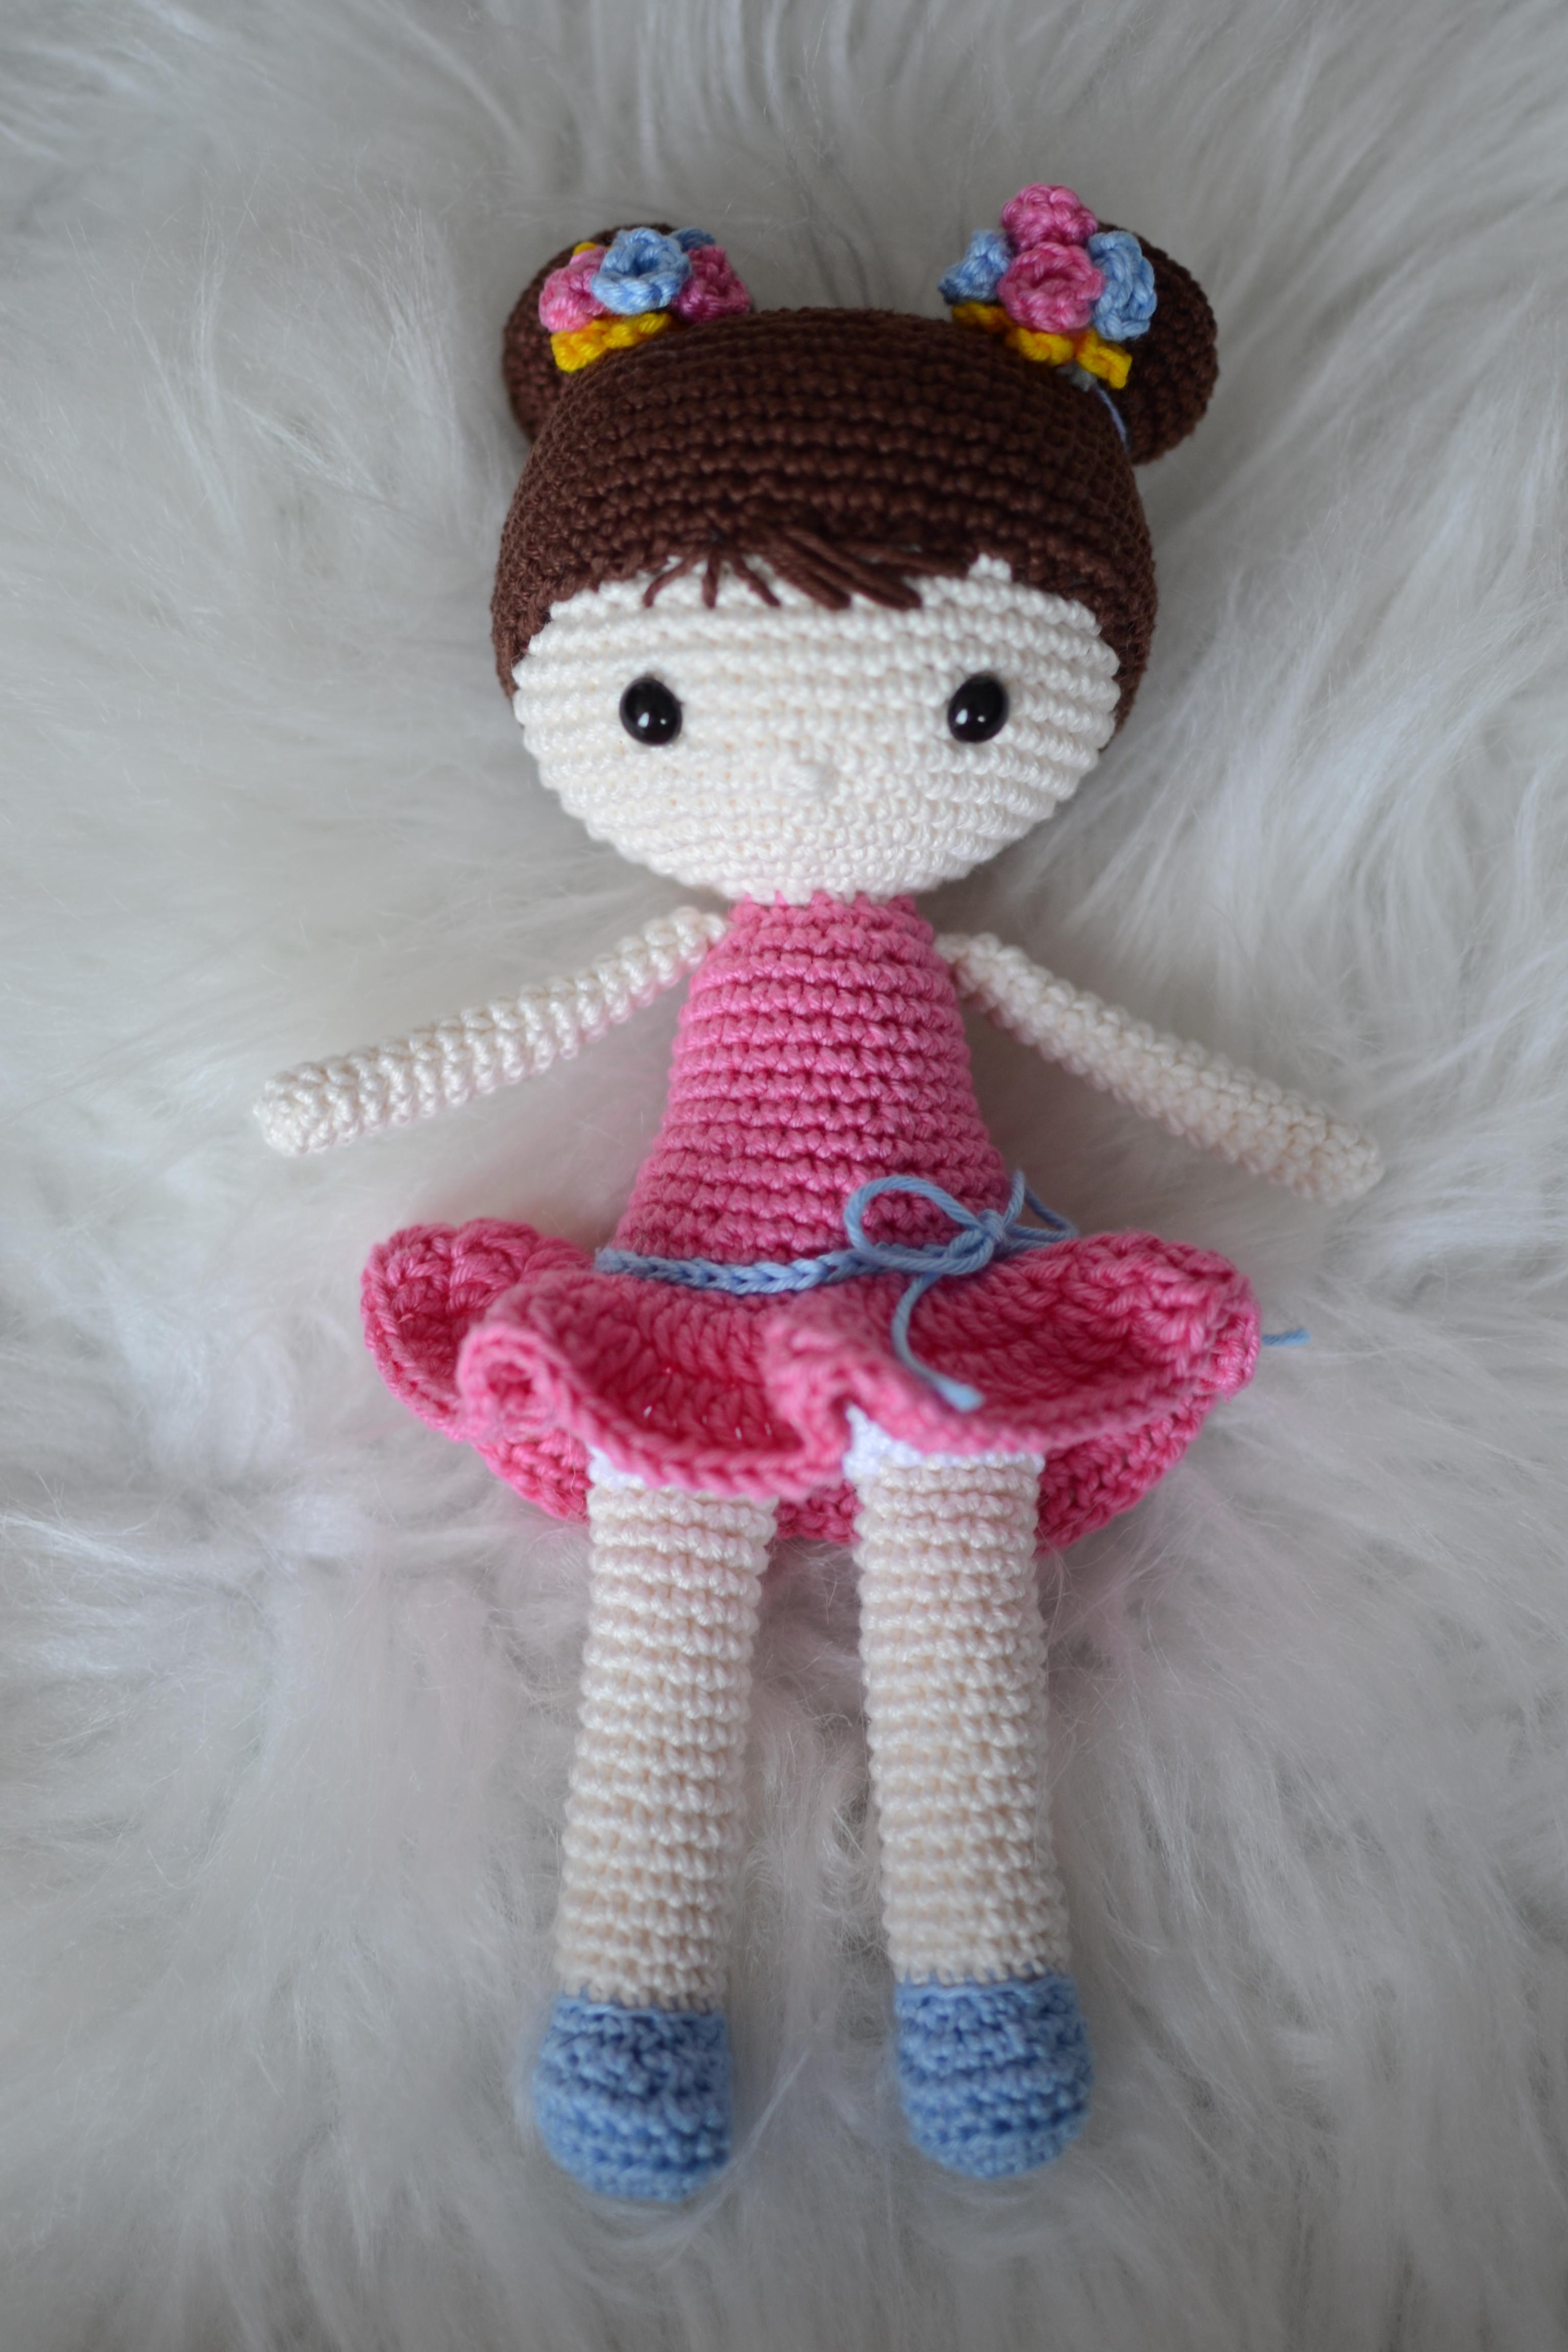 Boneca amigurumi/ boneca crochê (Loira) no Elo7 | Novelo de ideias ... | 4608x3072